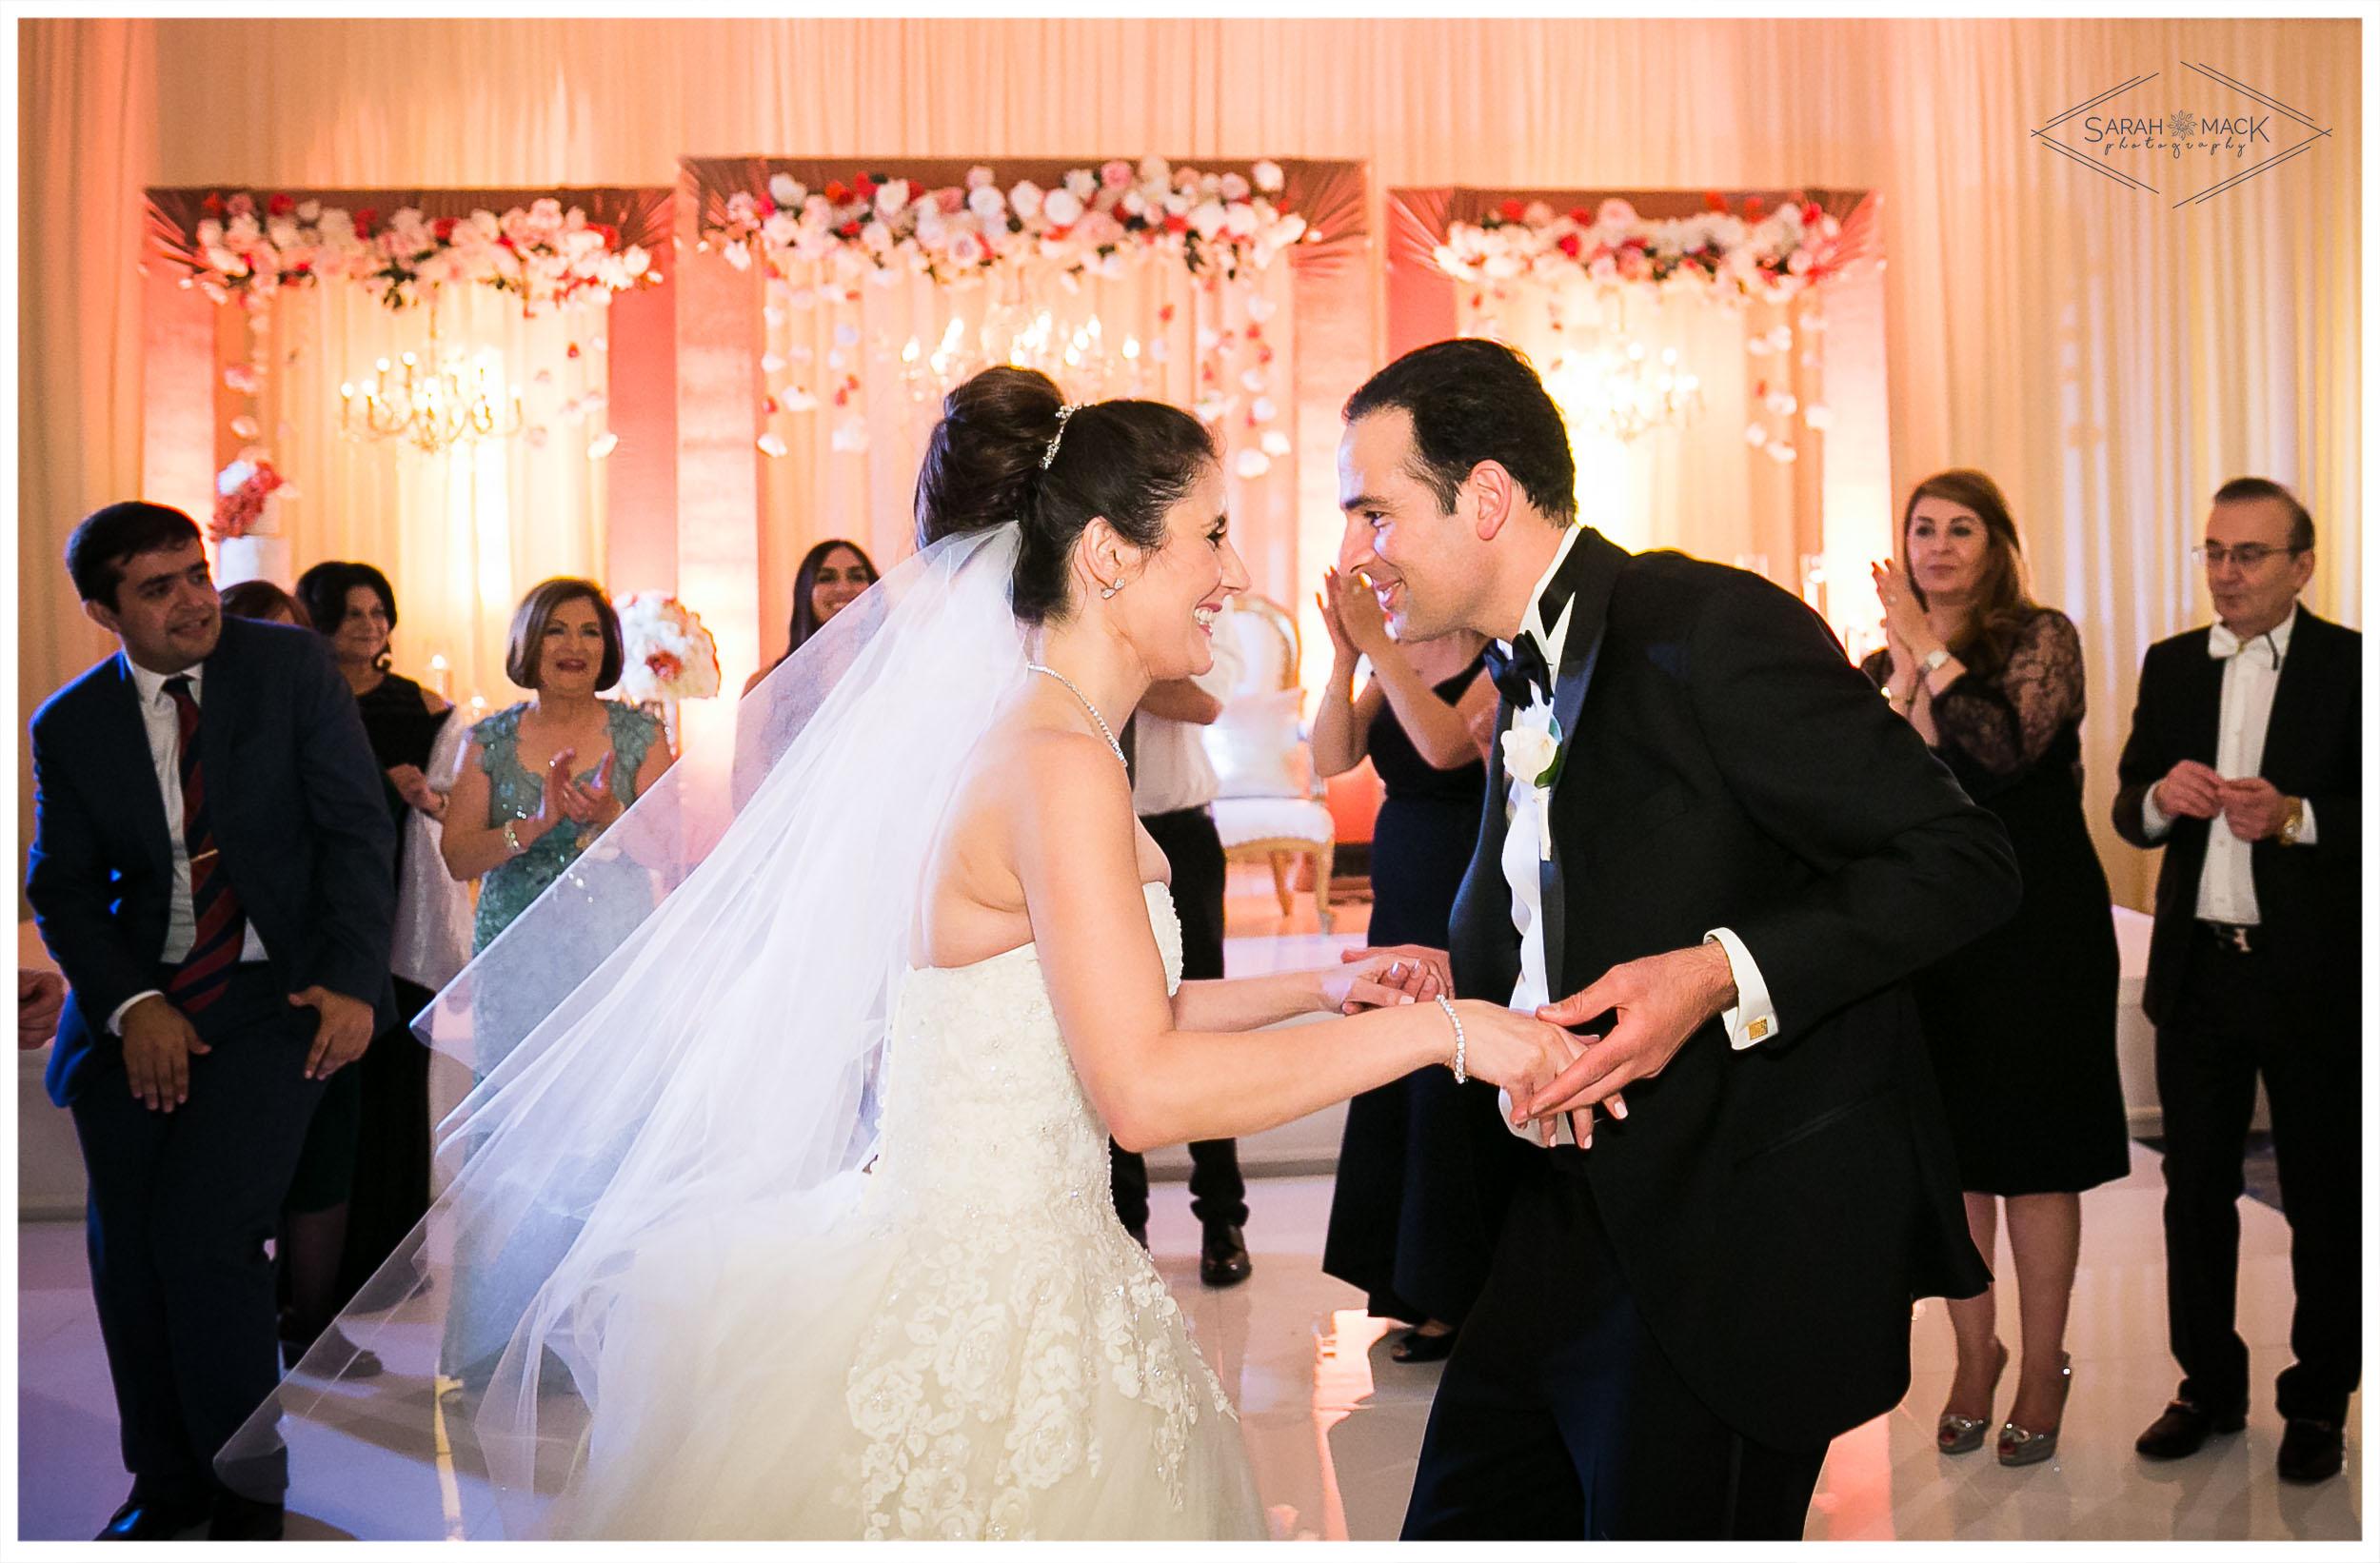 NJ-Newport-Beach-Marriott-Persian-Wedding-42.jpg